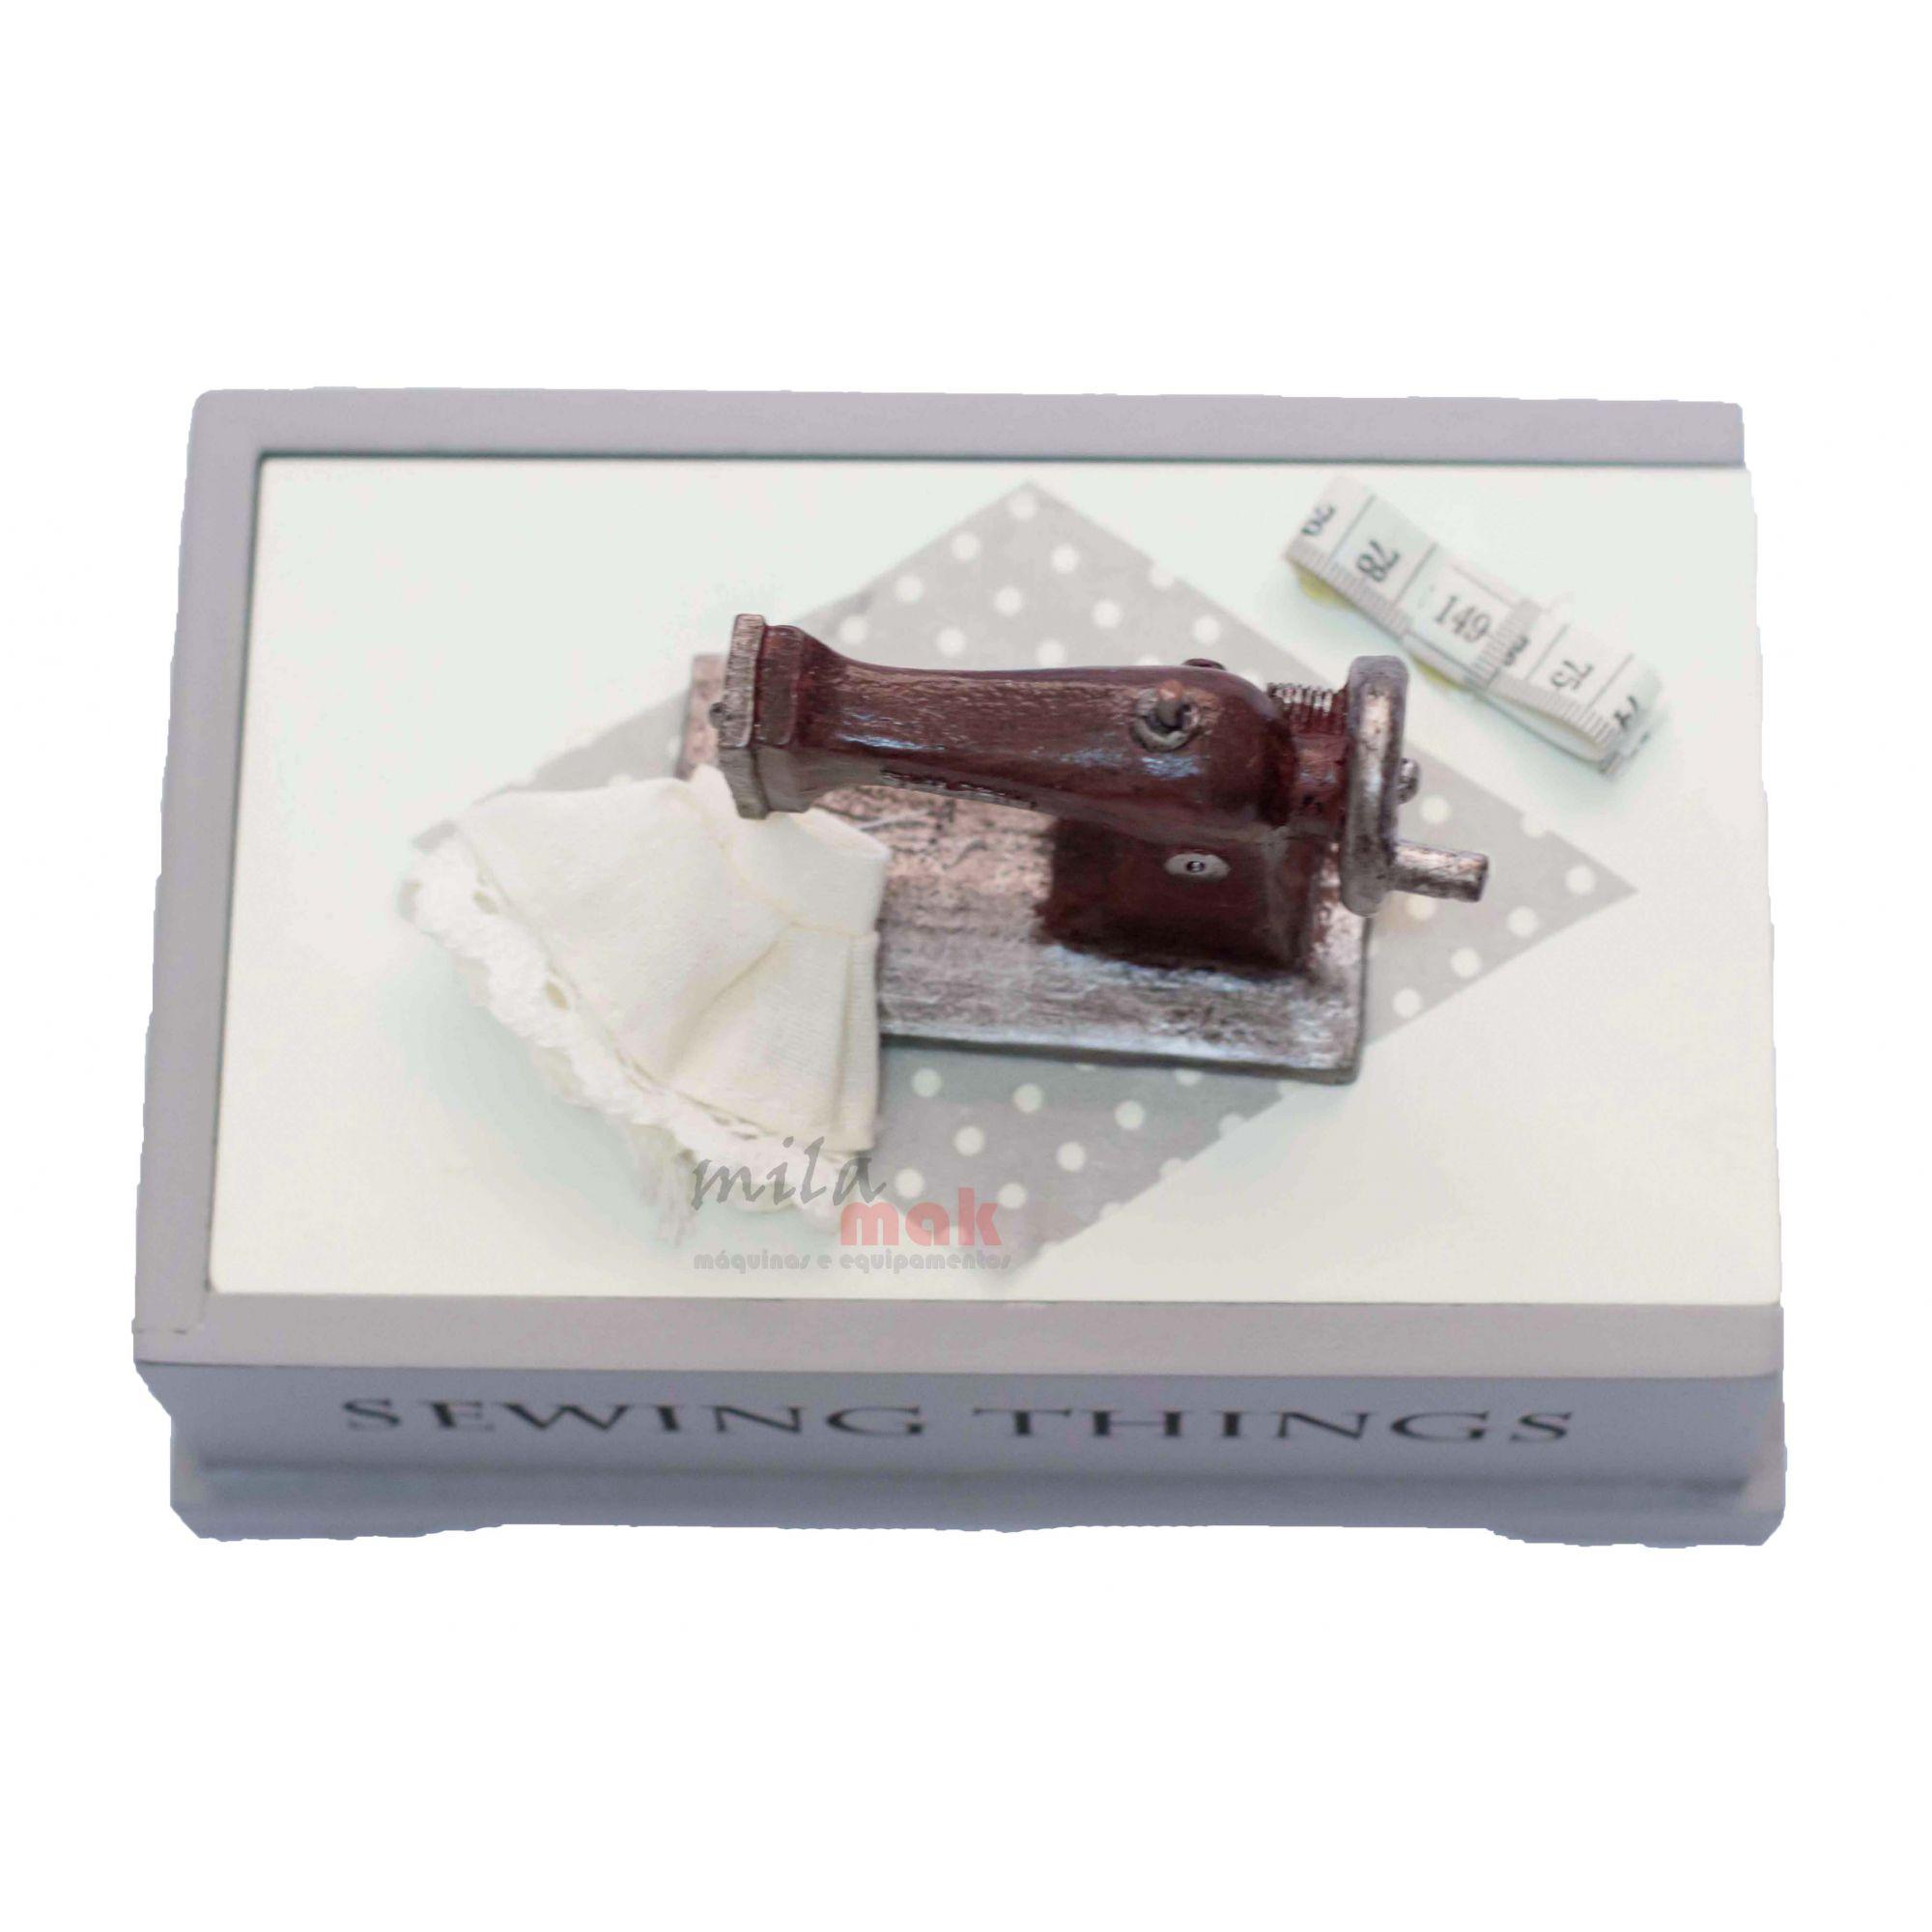 Mini Máquina De Costura Decorativa e porta objetos - com tampa deslizante